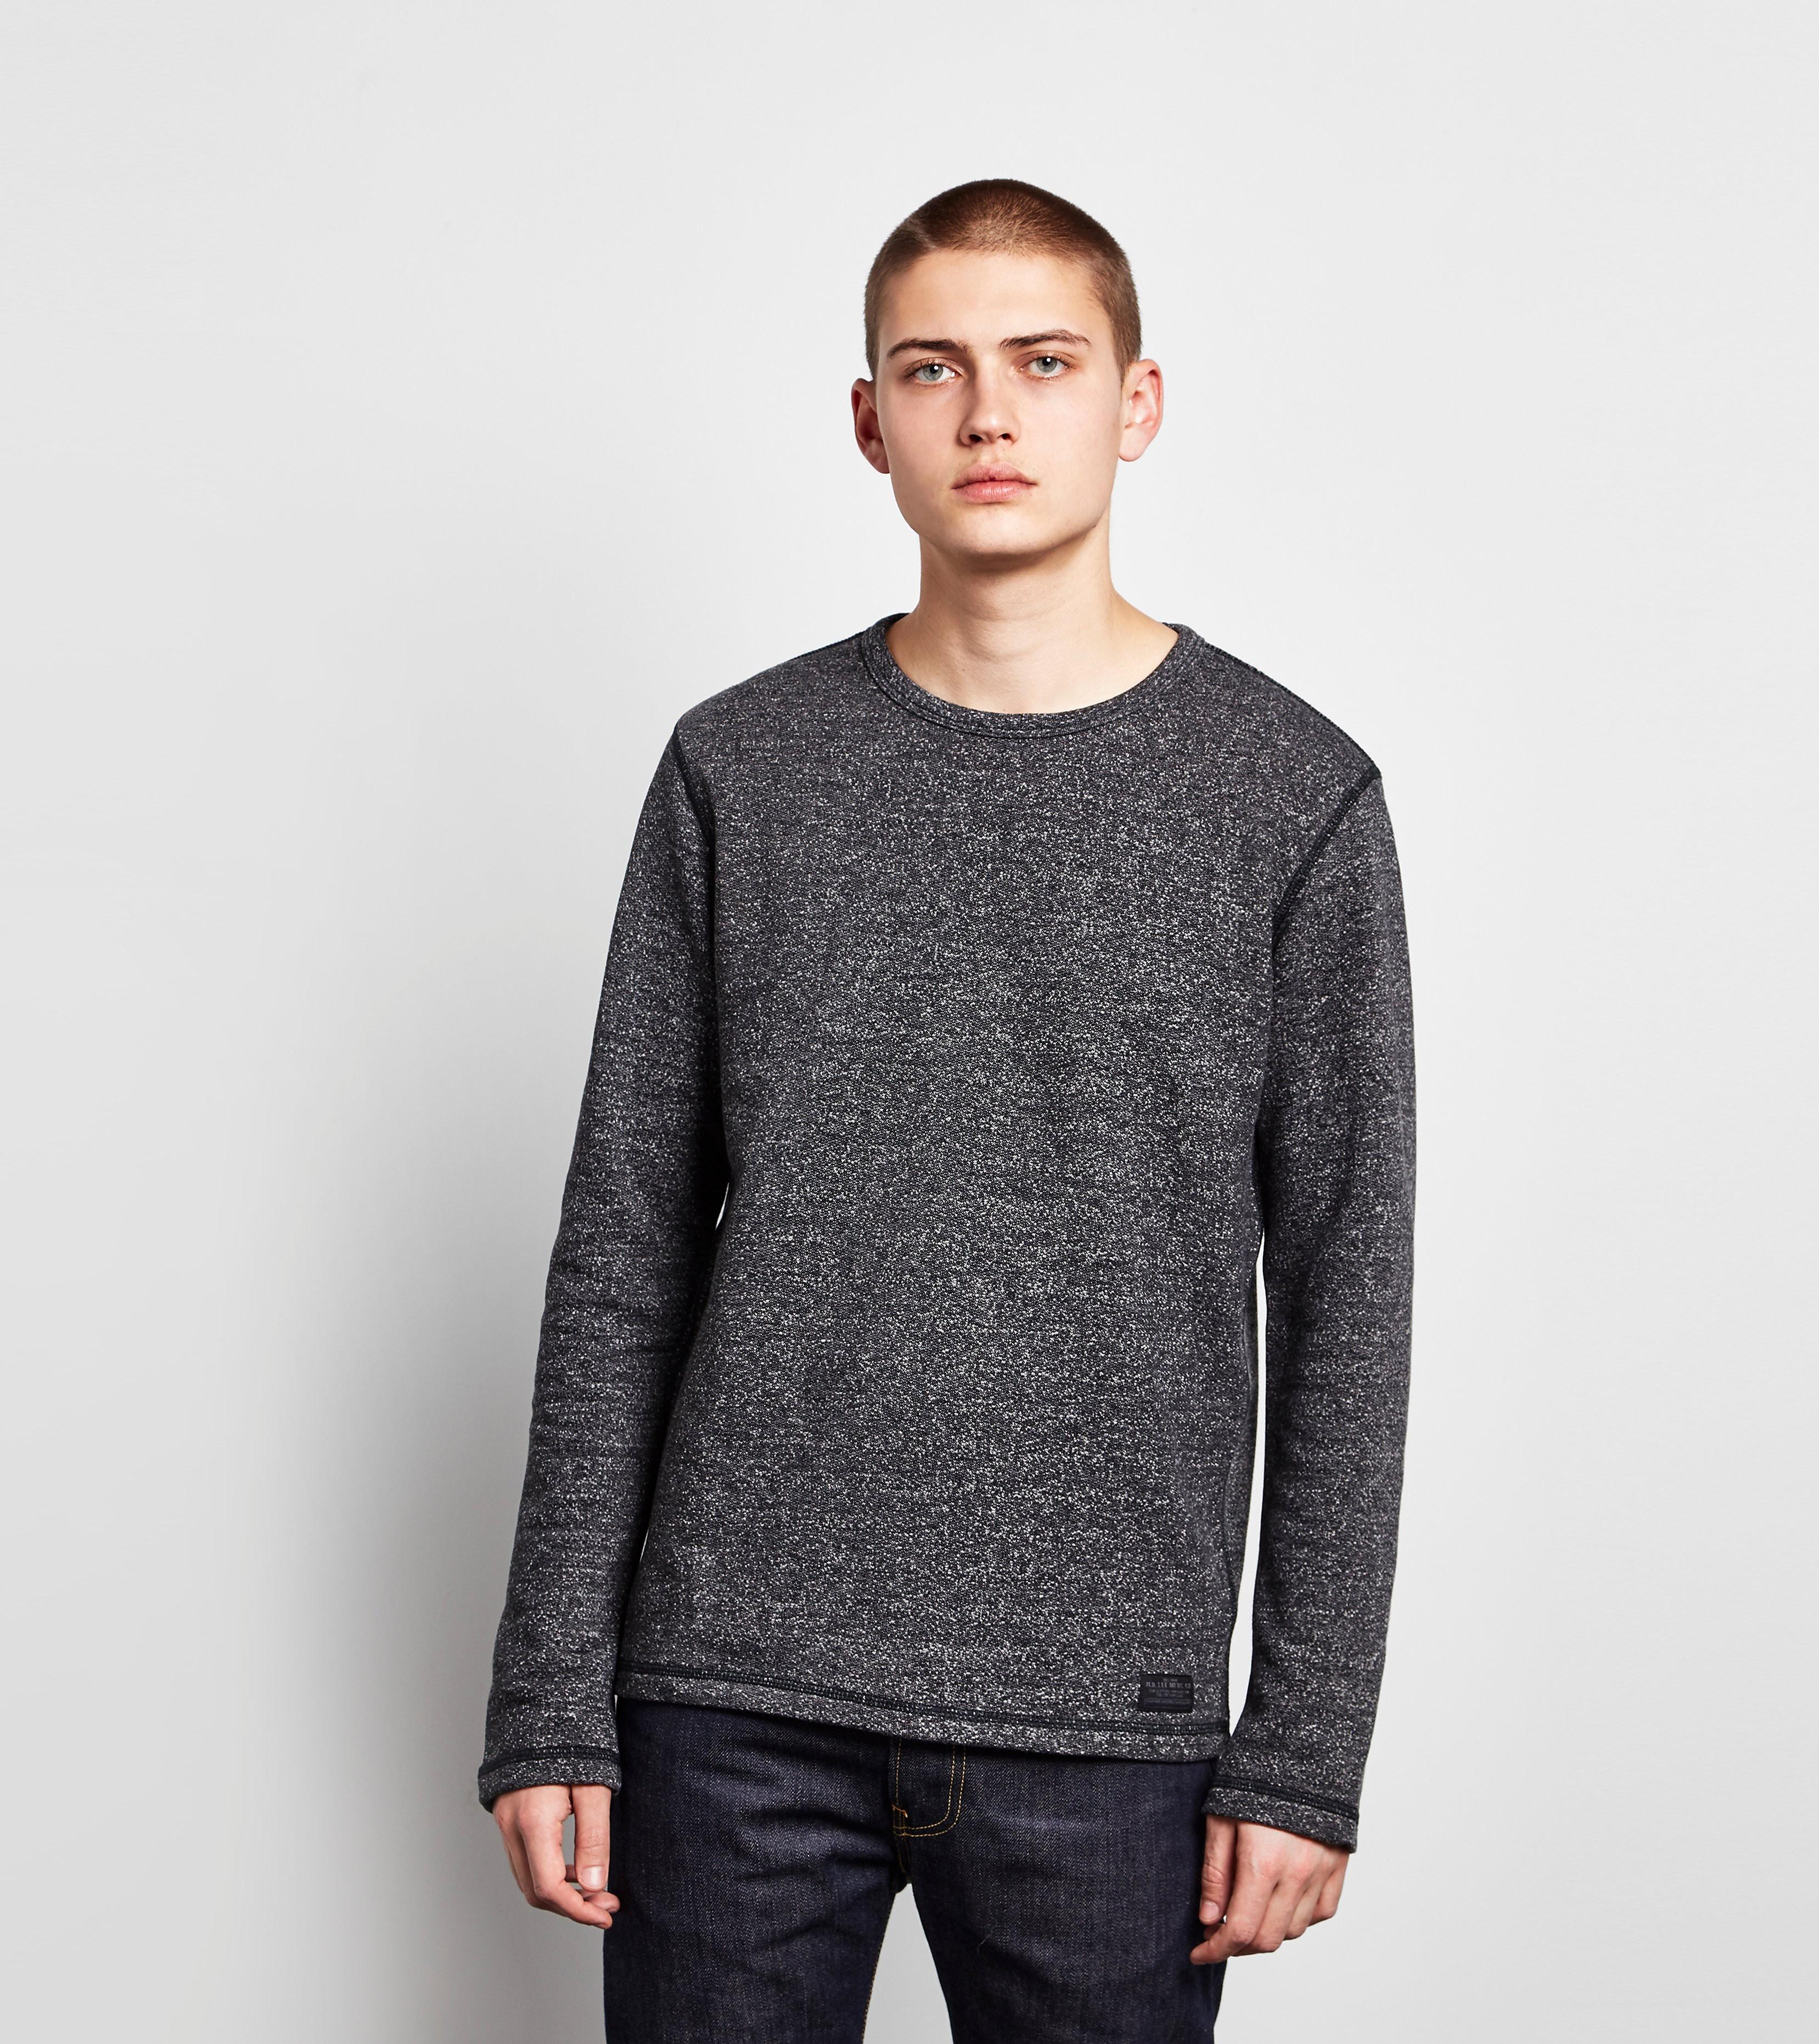 Lee Long-Sleeved Marl T-Shirt